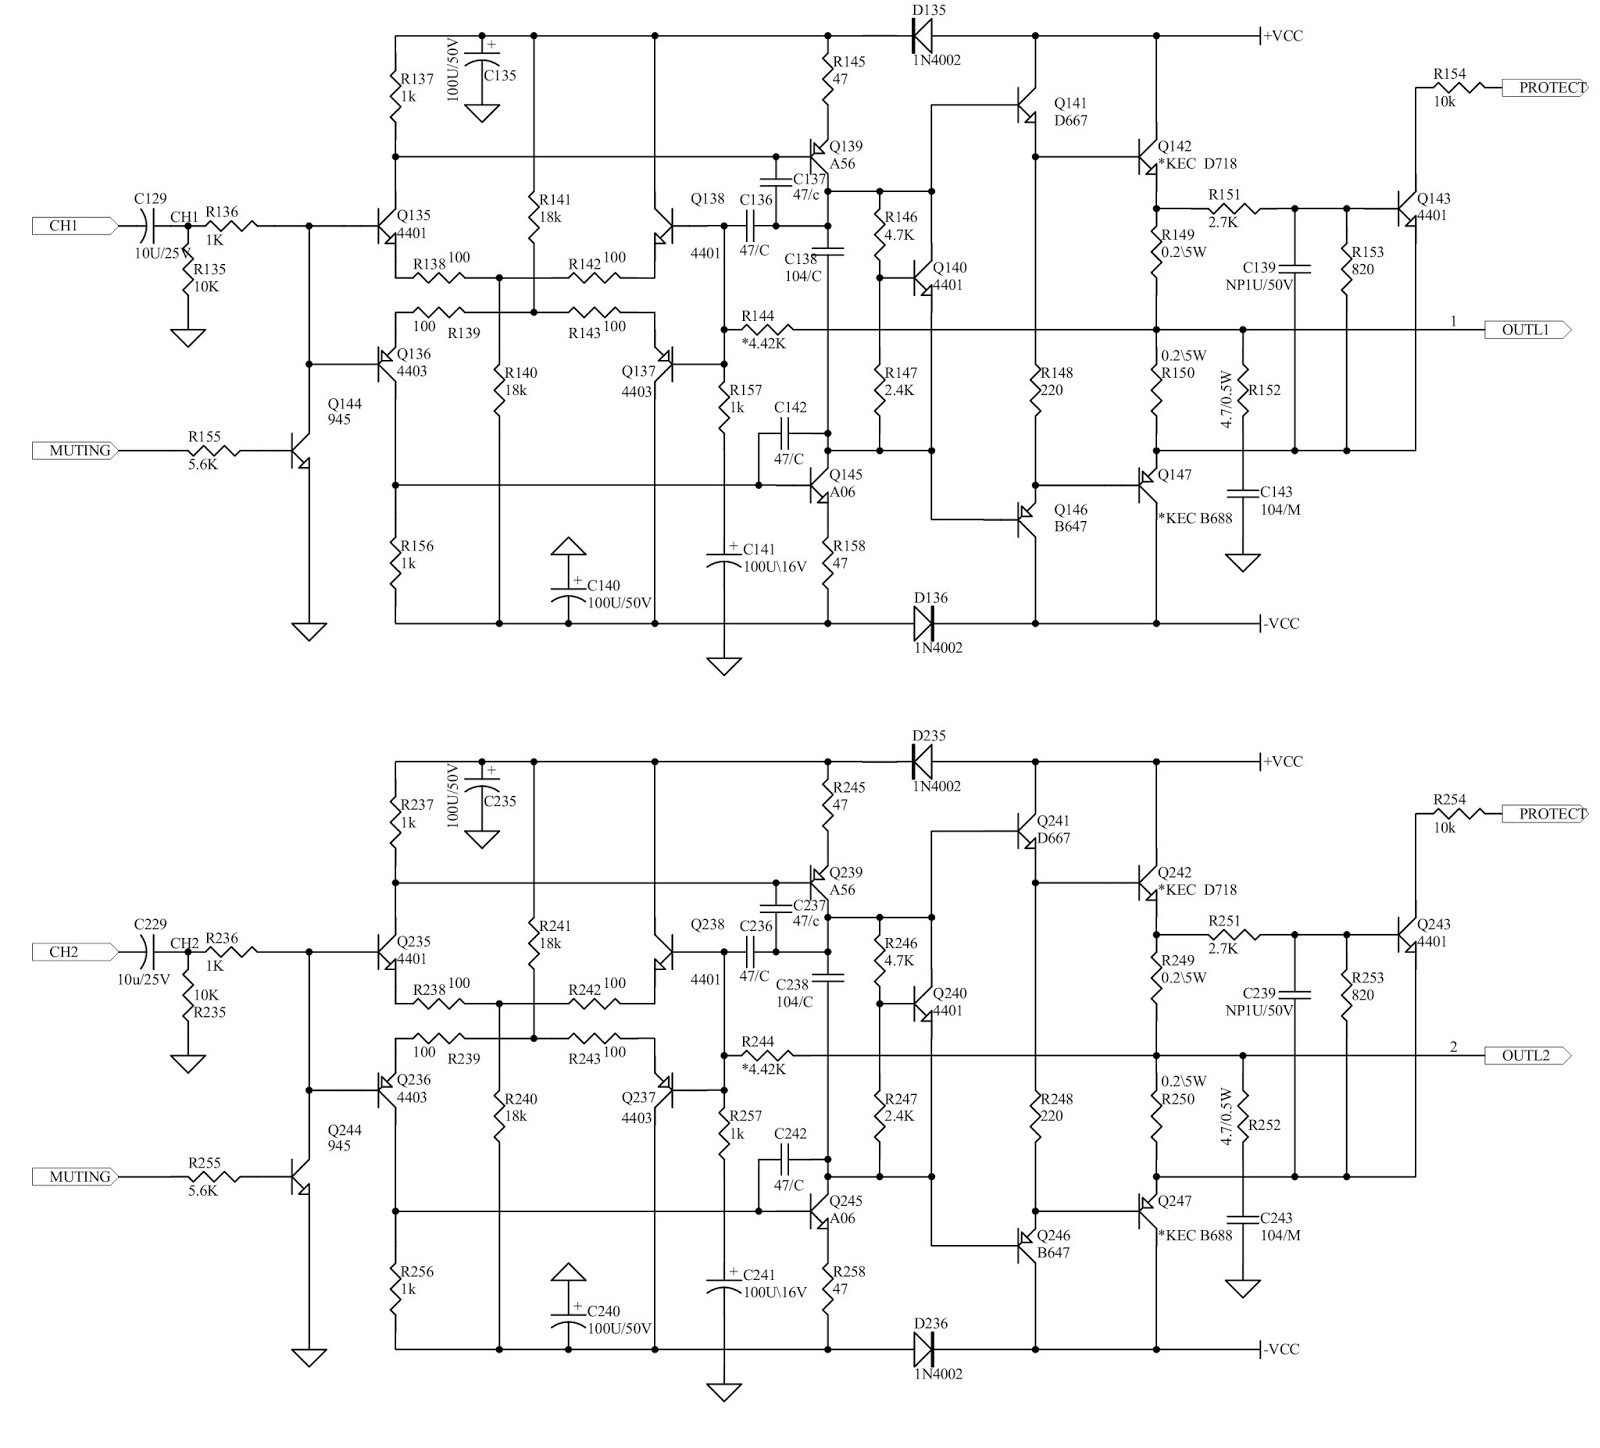 jbl wiring diagram jbl free engine image for user manual